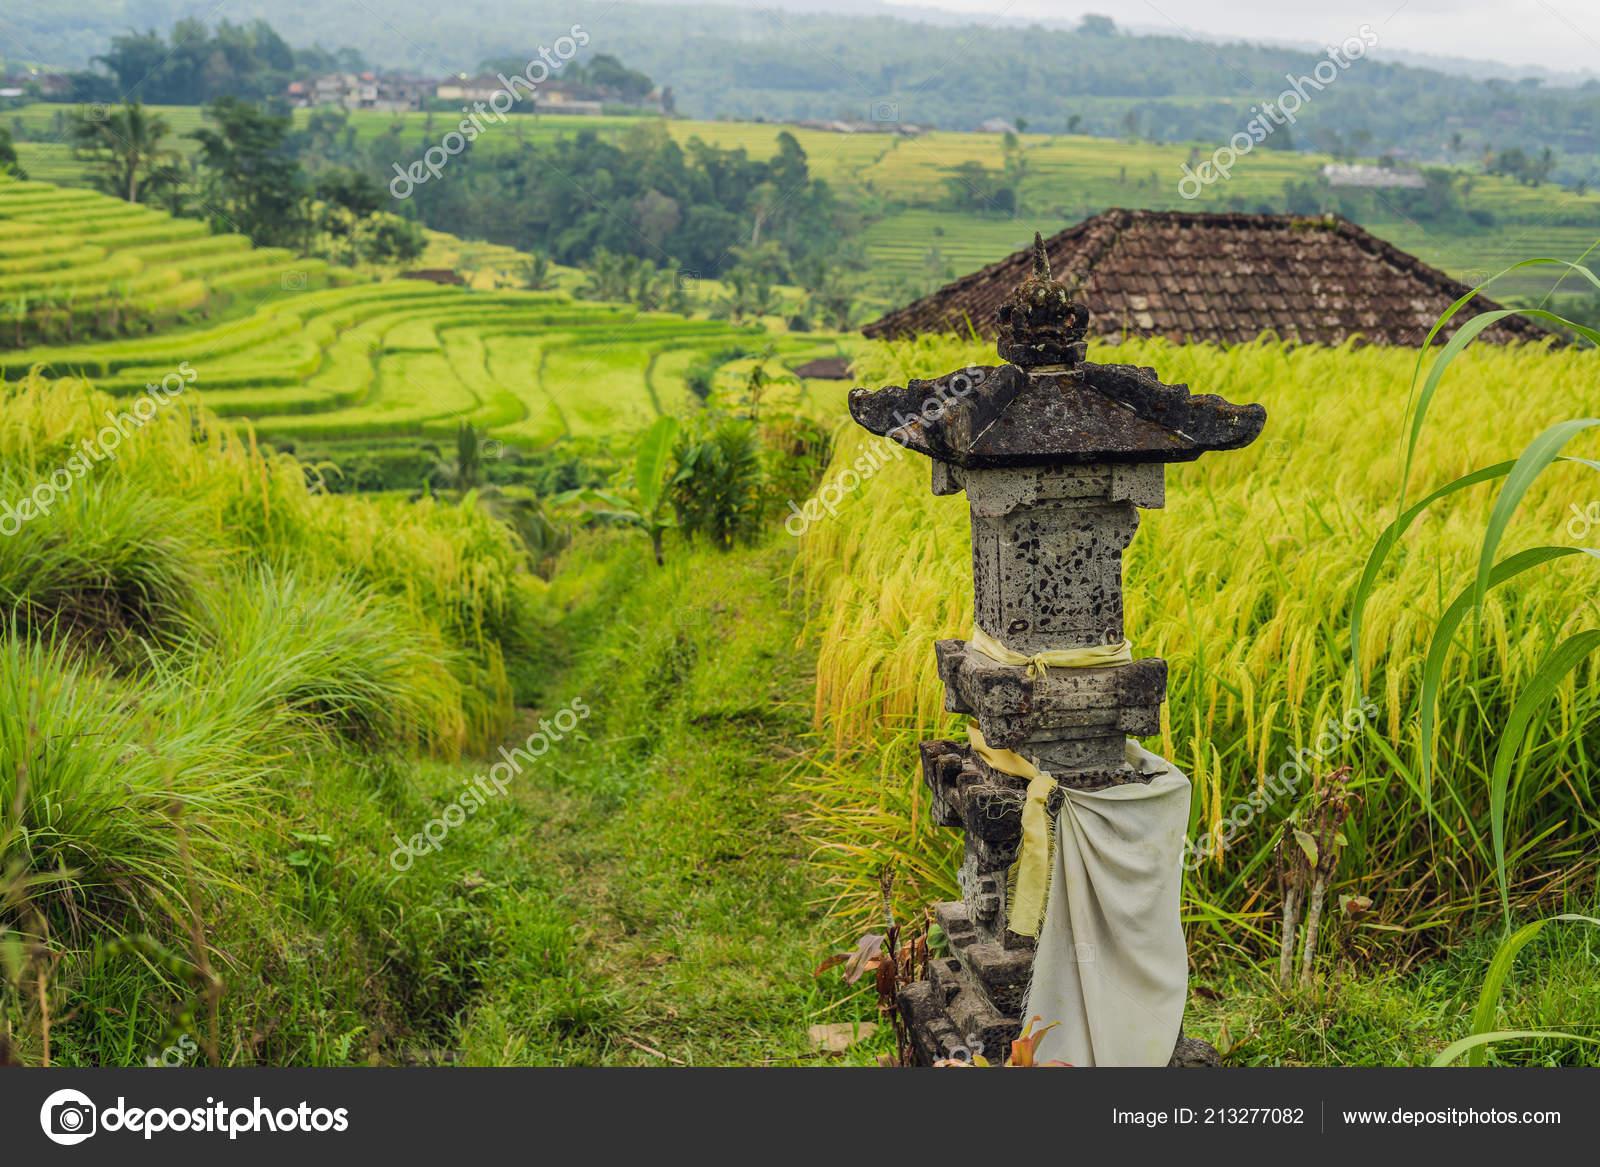 Ancient Statue Jatiluwih Rice Terraces Bali Indonesia Stock Photo